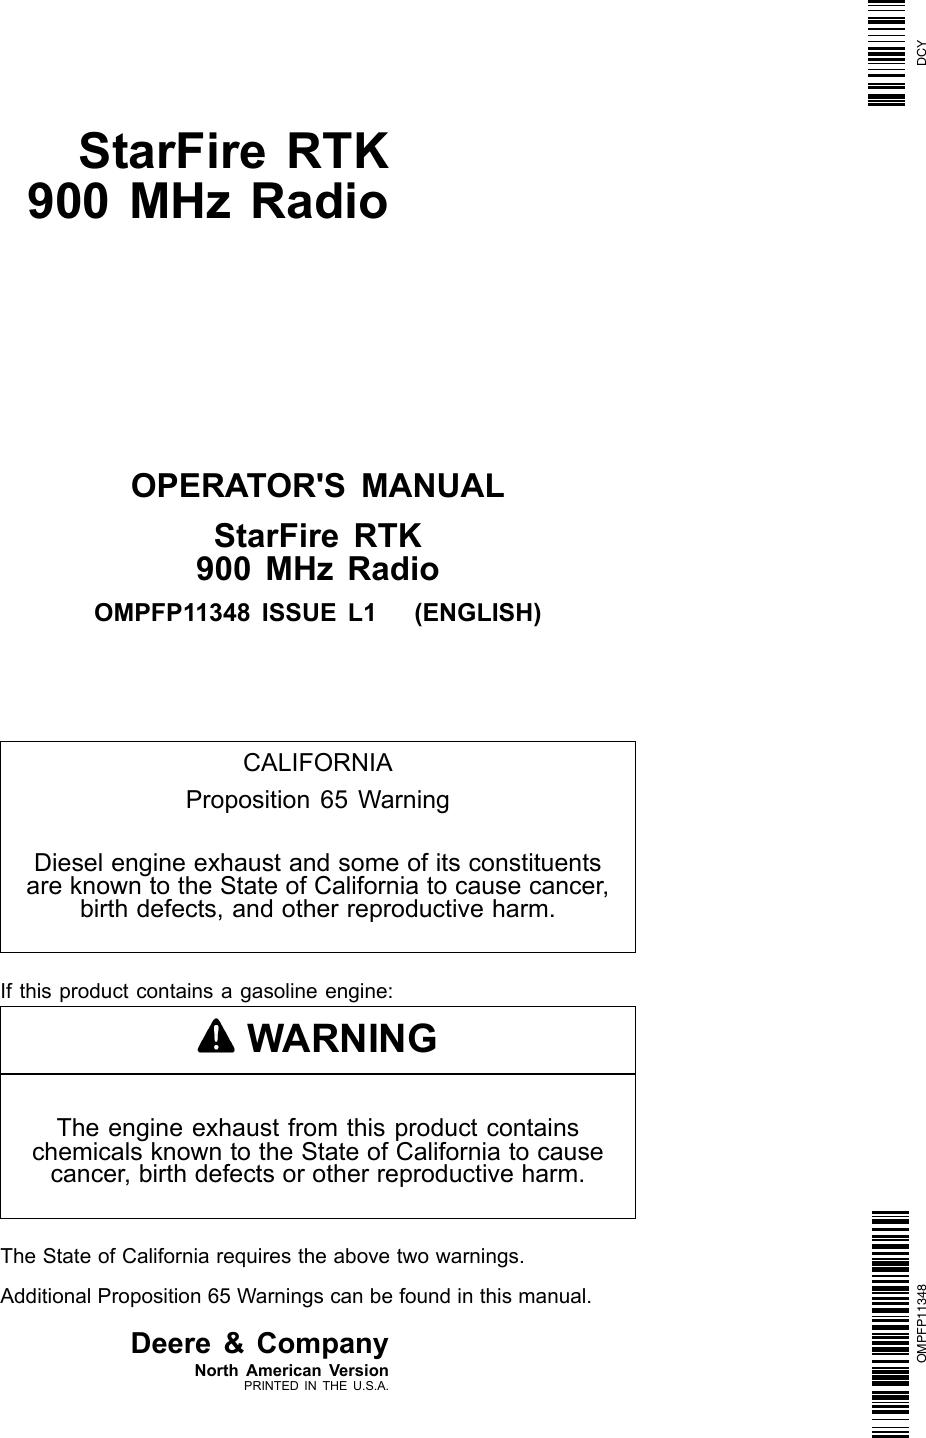 John Deere Starfire Rtk Ompfp11348 Users Manual 950 Wiring Diagram On 790